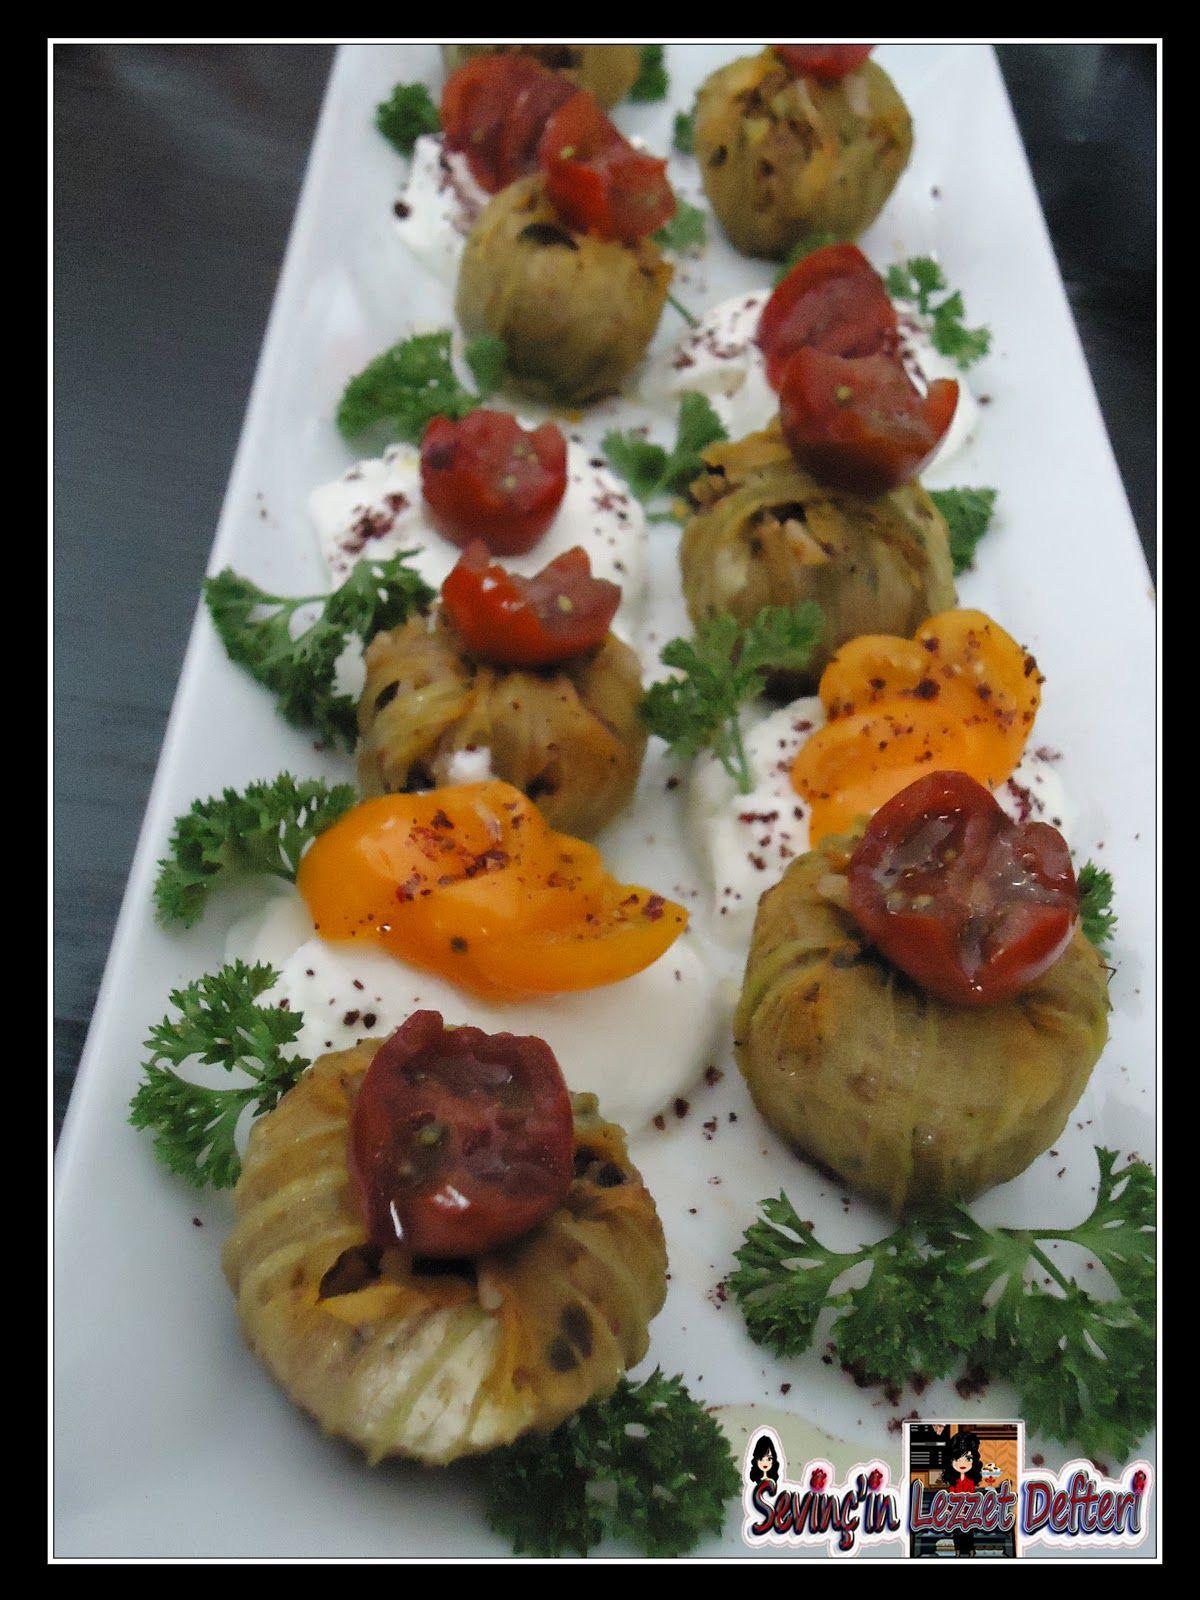 ★Sevinç YİĞİT ARABACI ★  #StuffedZucchiniFlowers   #TurkishFood  #KabakCicegiDolmasi   #SevincinLezzetDefteri  #Dolma   #Food   #Blog   #Taste   #SevincYigitArabaci   #Recipes   #YemekTarifleri  #Yummy   #Delicious   #SevincinDunyasi sevincinlezzetdefteri.blogspot.com ✔